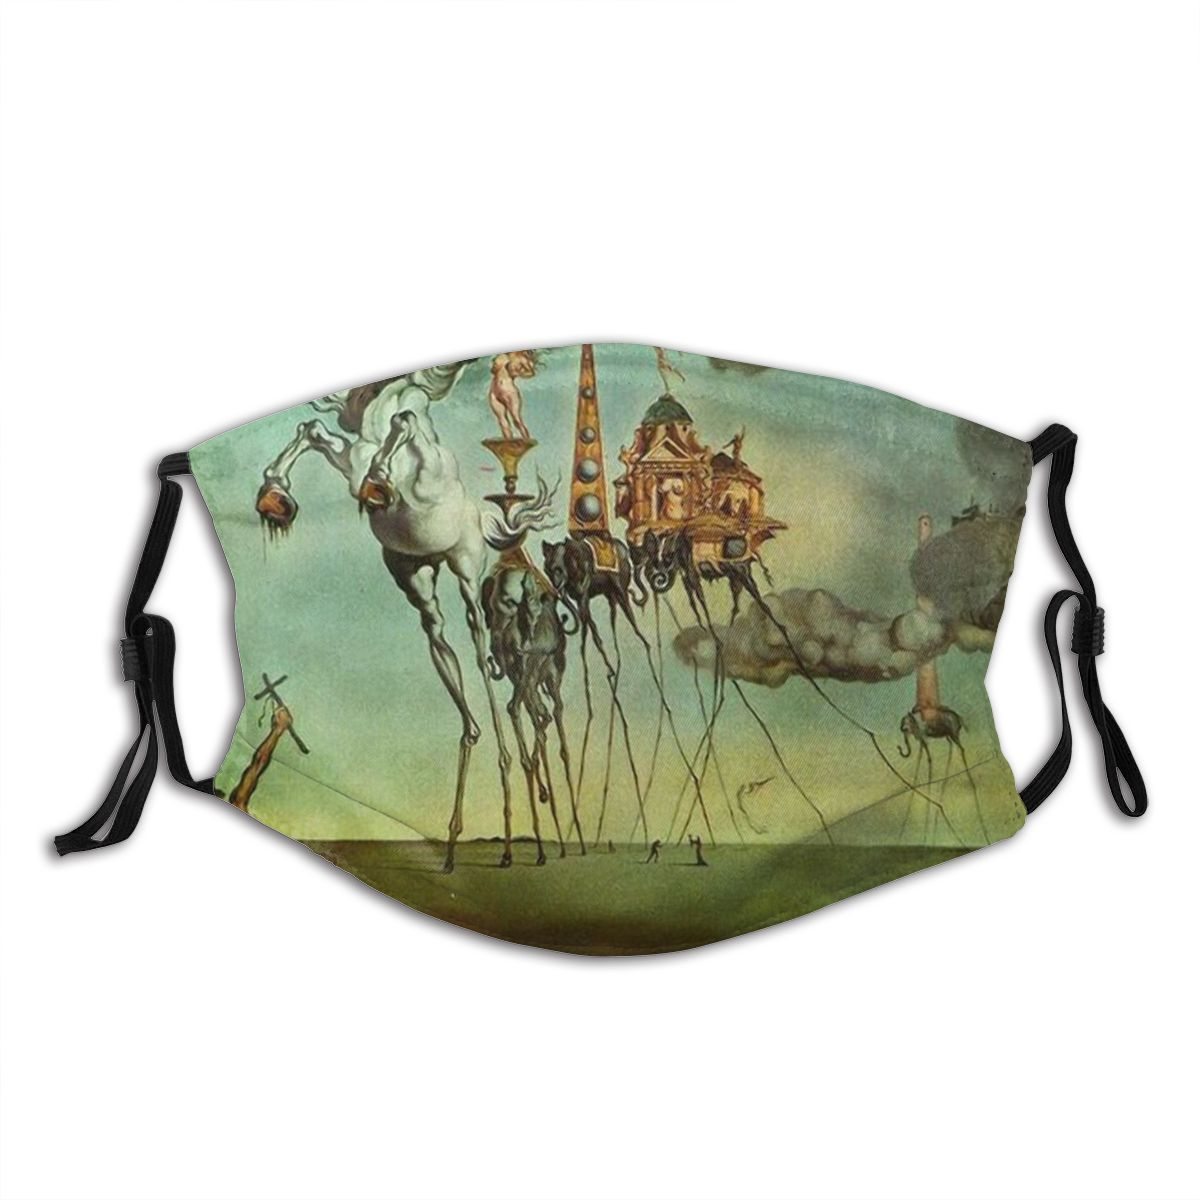 Salvador dali surrealismo arte reutilizável máscara facial anti haze dustproof máscara com filtros capa de proteção respirador boca muffle